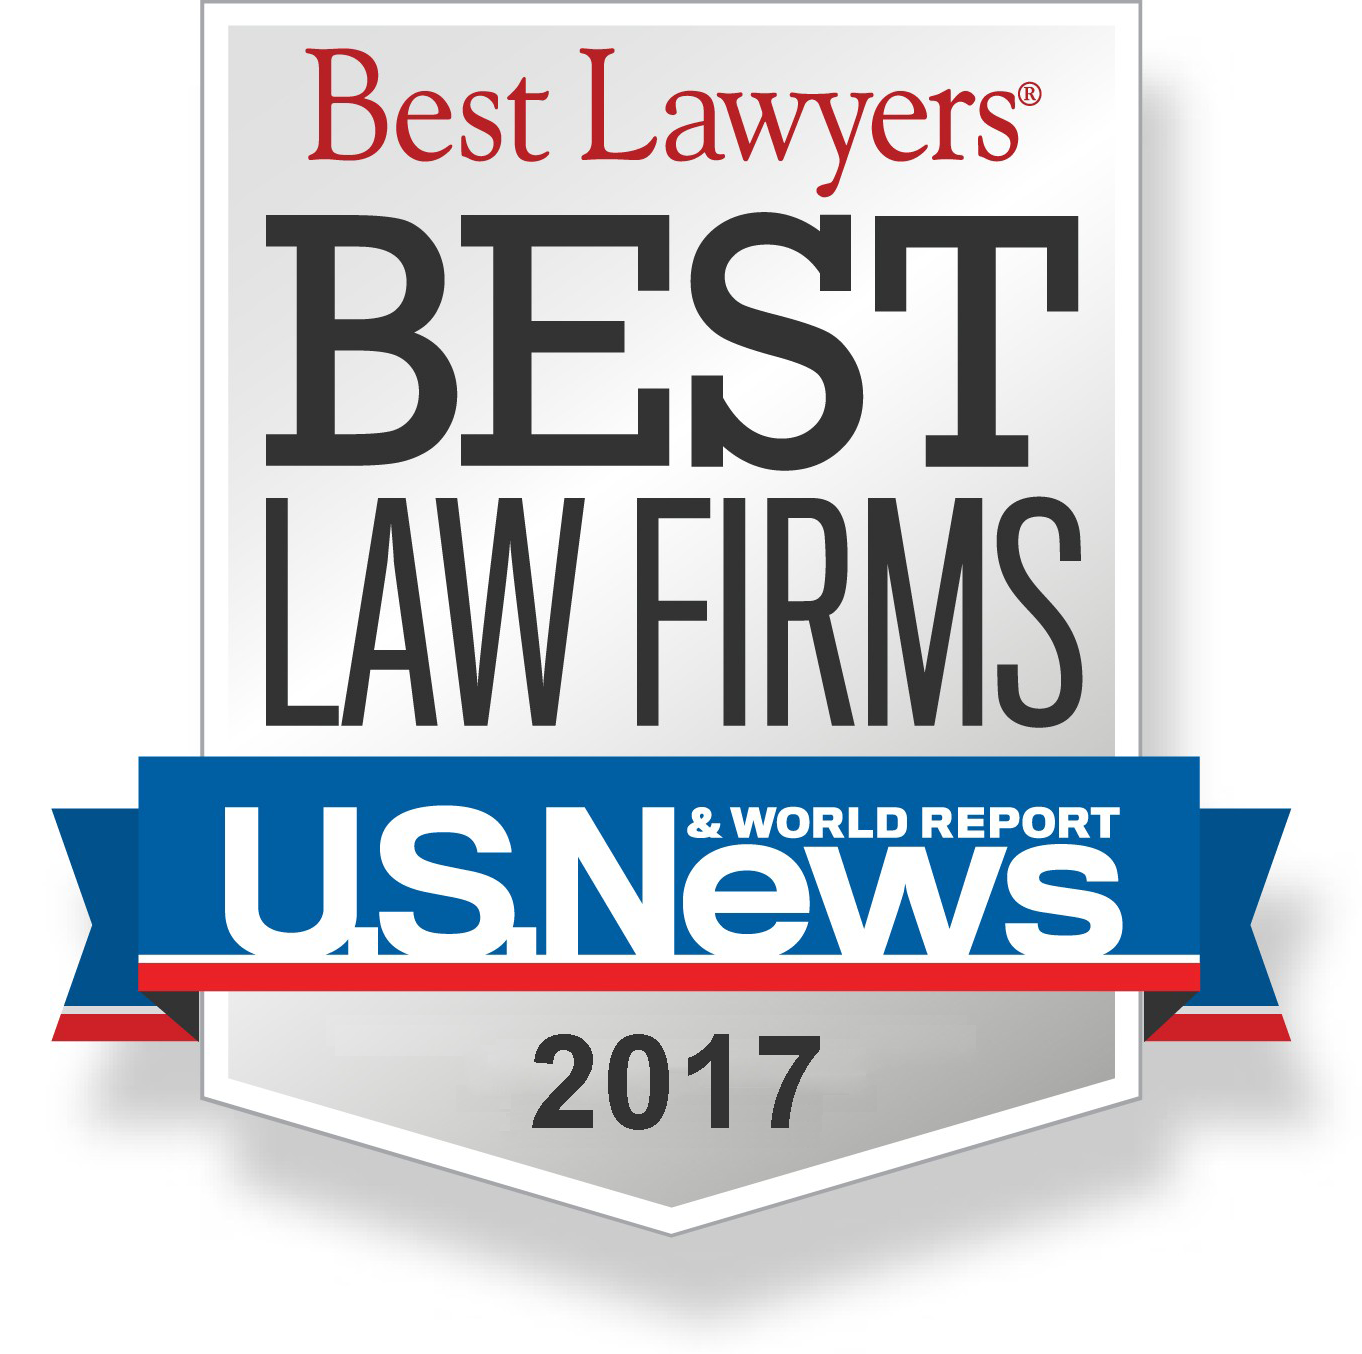 d035f98a669b19c749c4_Best-Law-Firms-2017.jpg